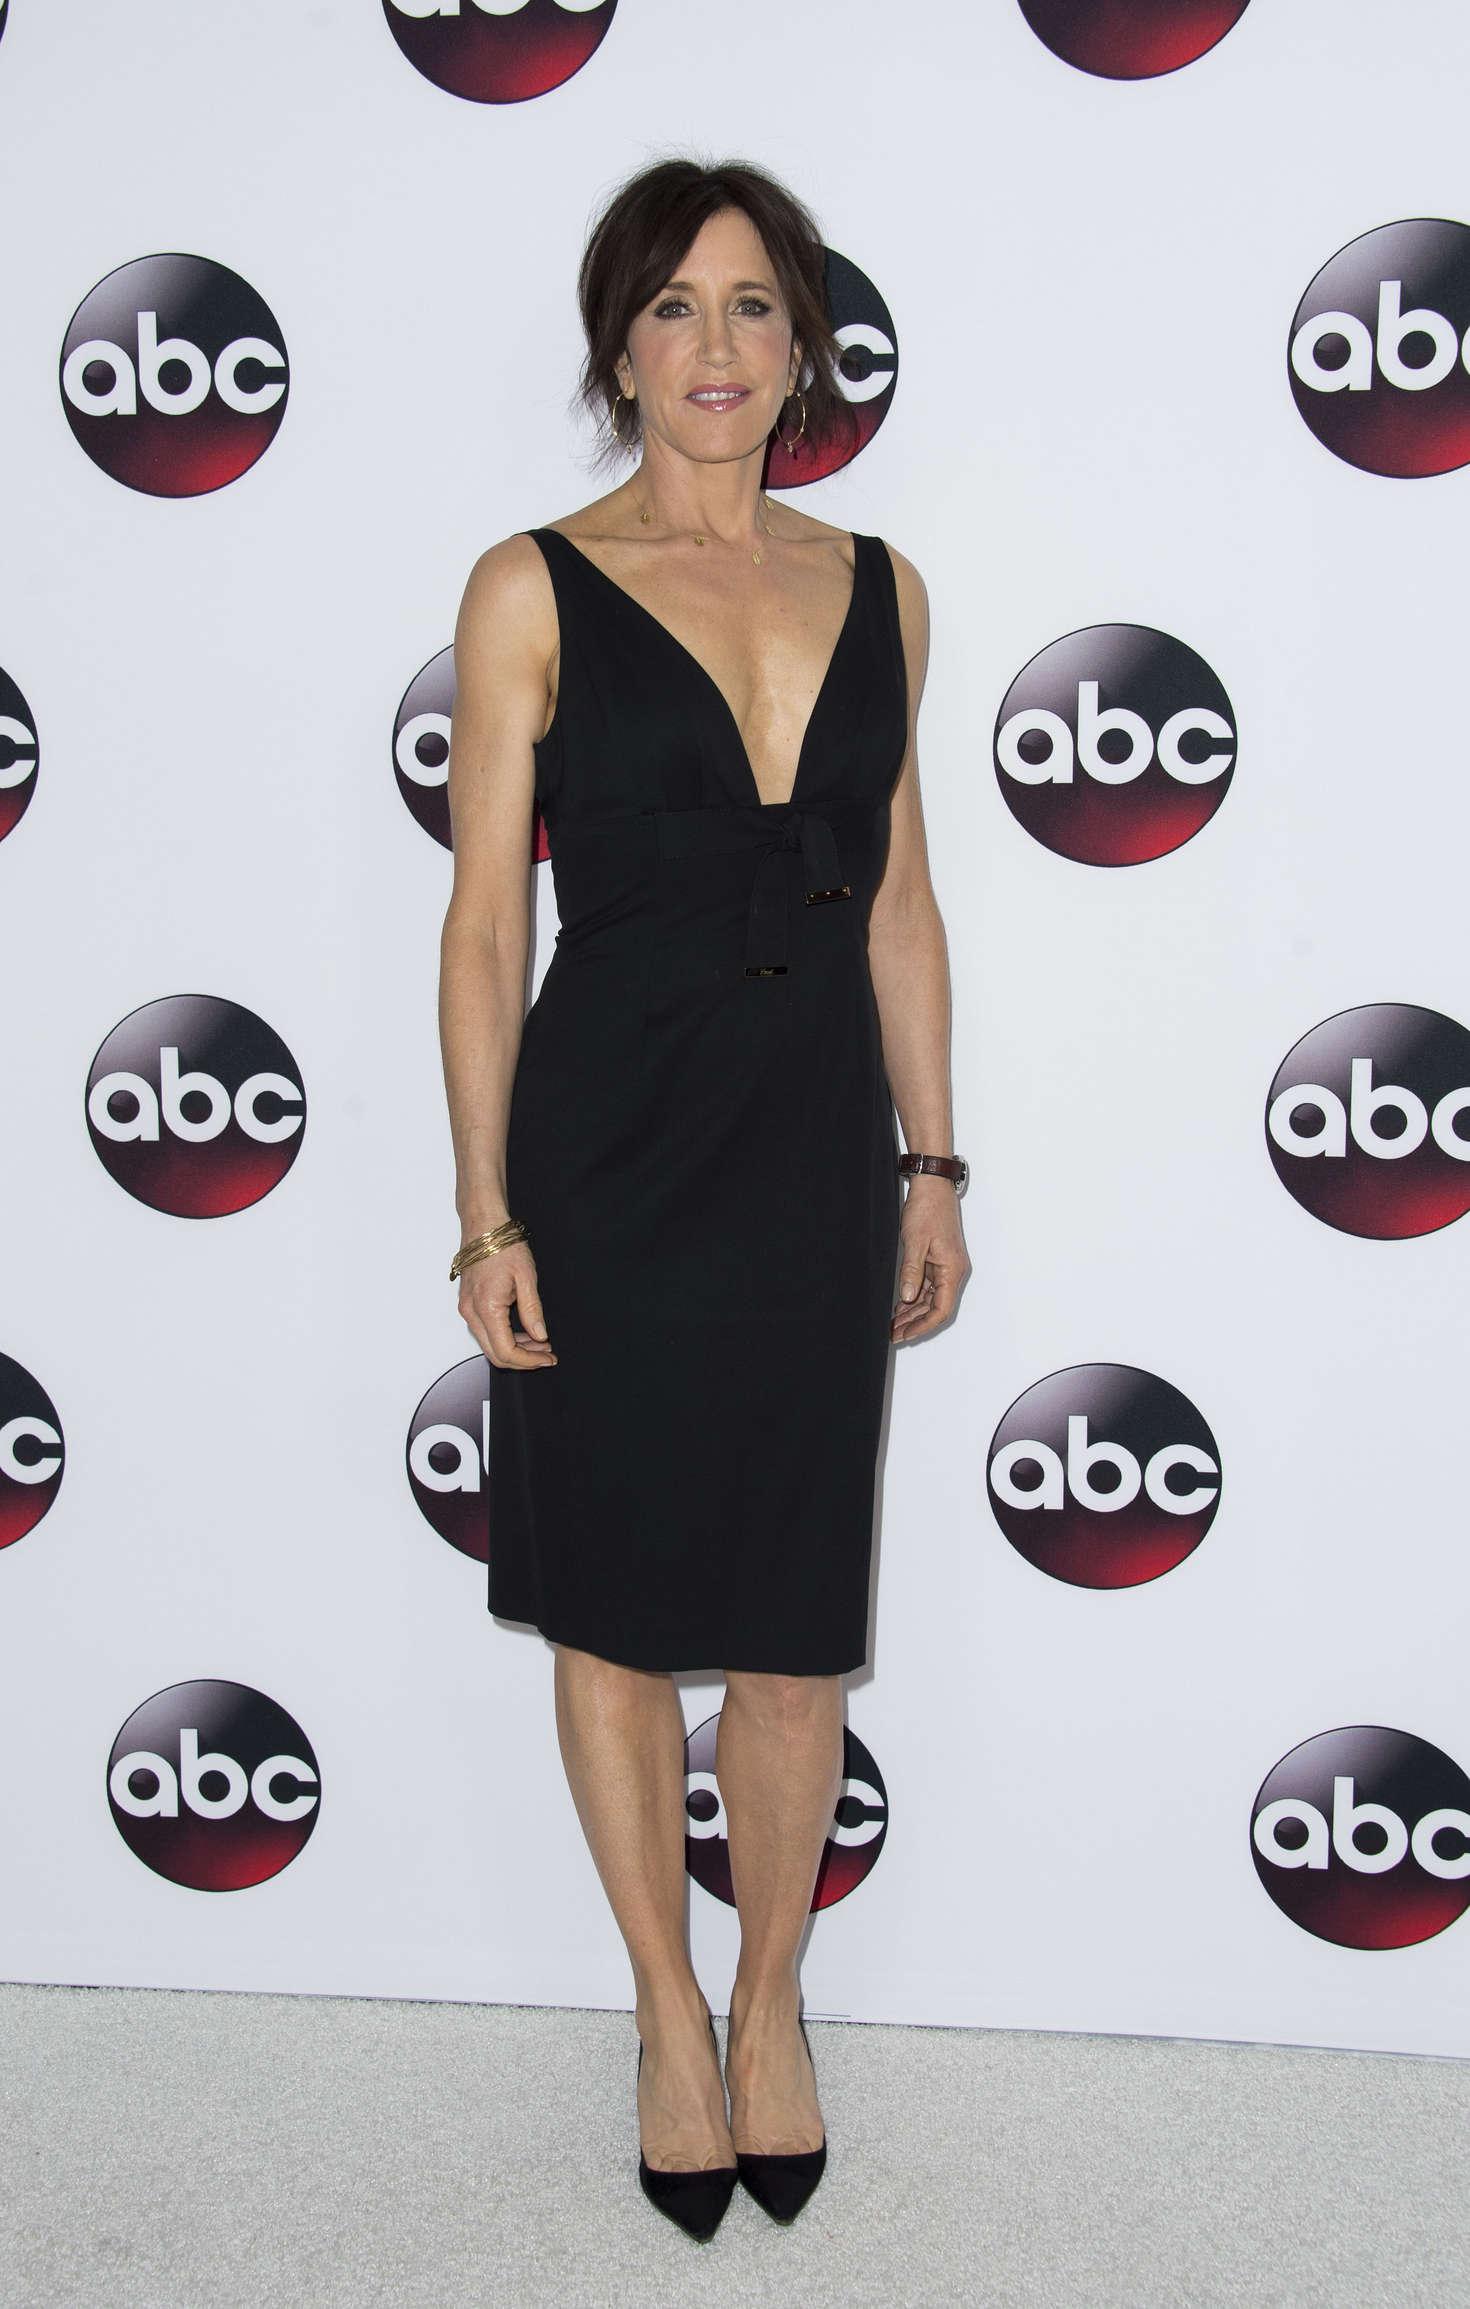 Felicity Huffman Disney/ABC Winter TCA Press Tour in Pasadena